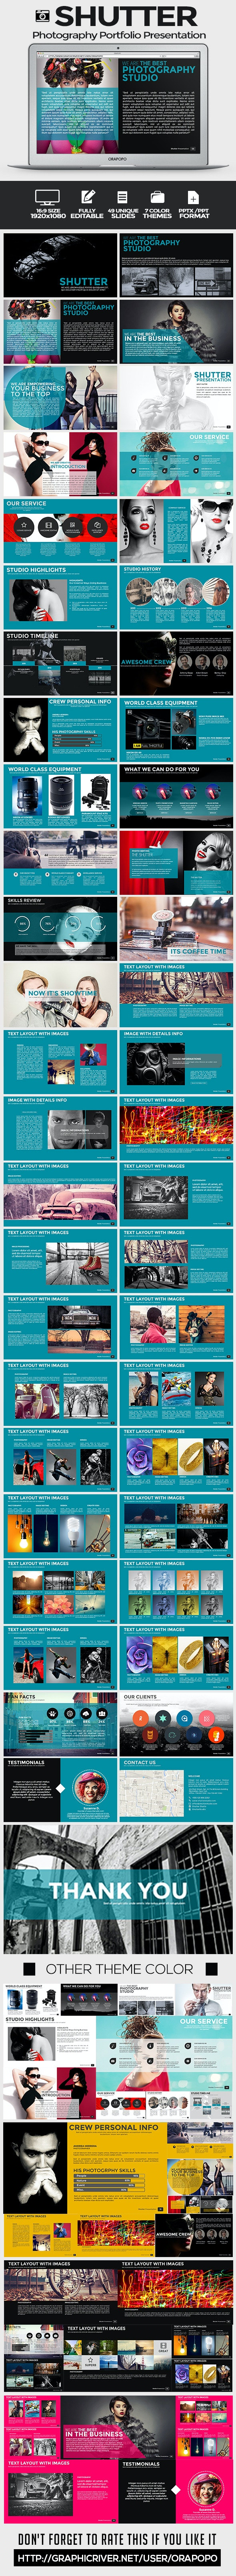 Shutter Photography Portfolio Presentation - Creative PowerPoint Templates